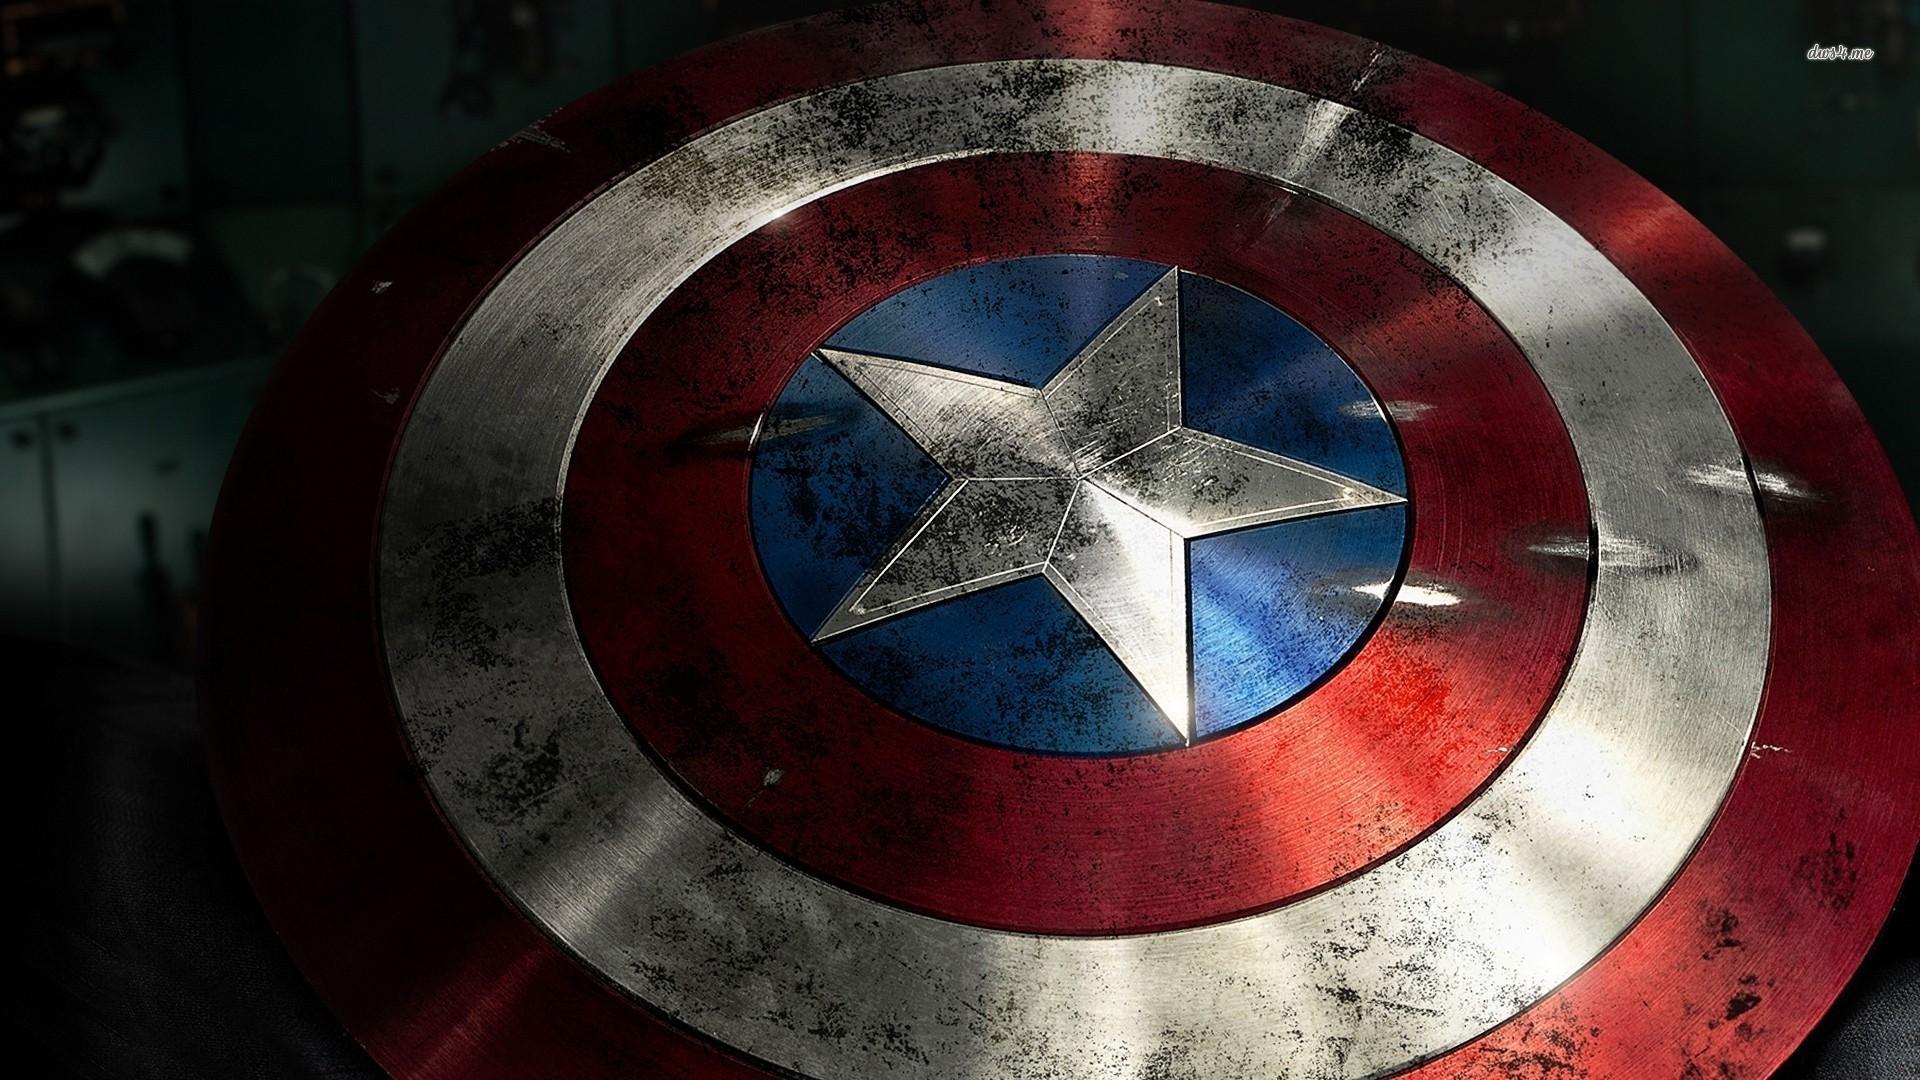 wallpaper 1680x1050 Captain America shield wallpaper 1920x1080 more 1920x1080